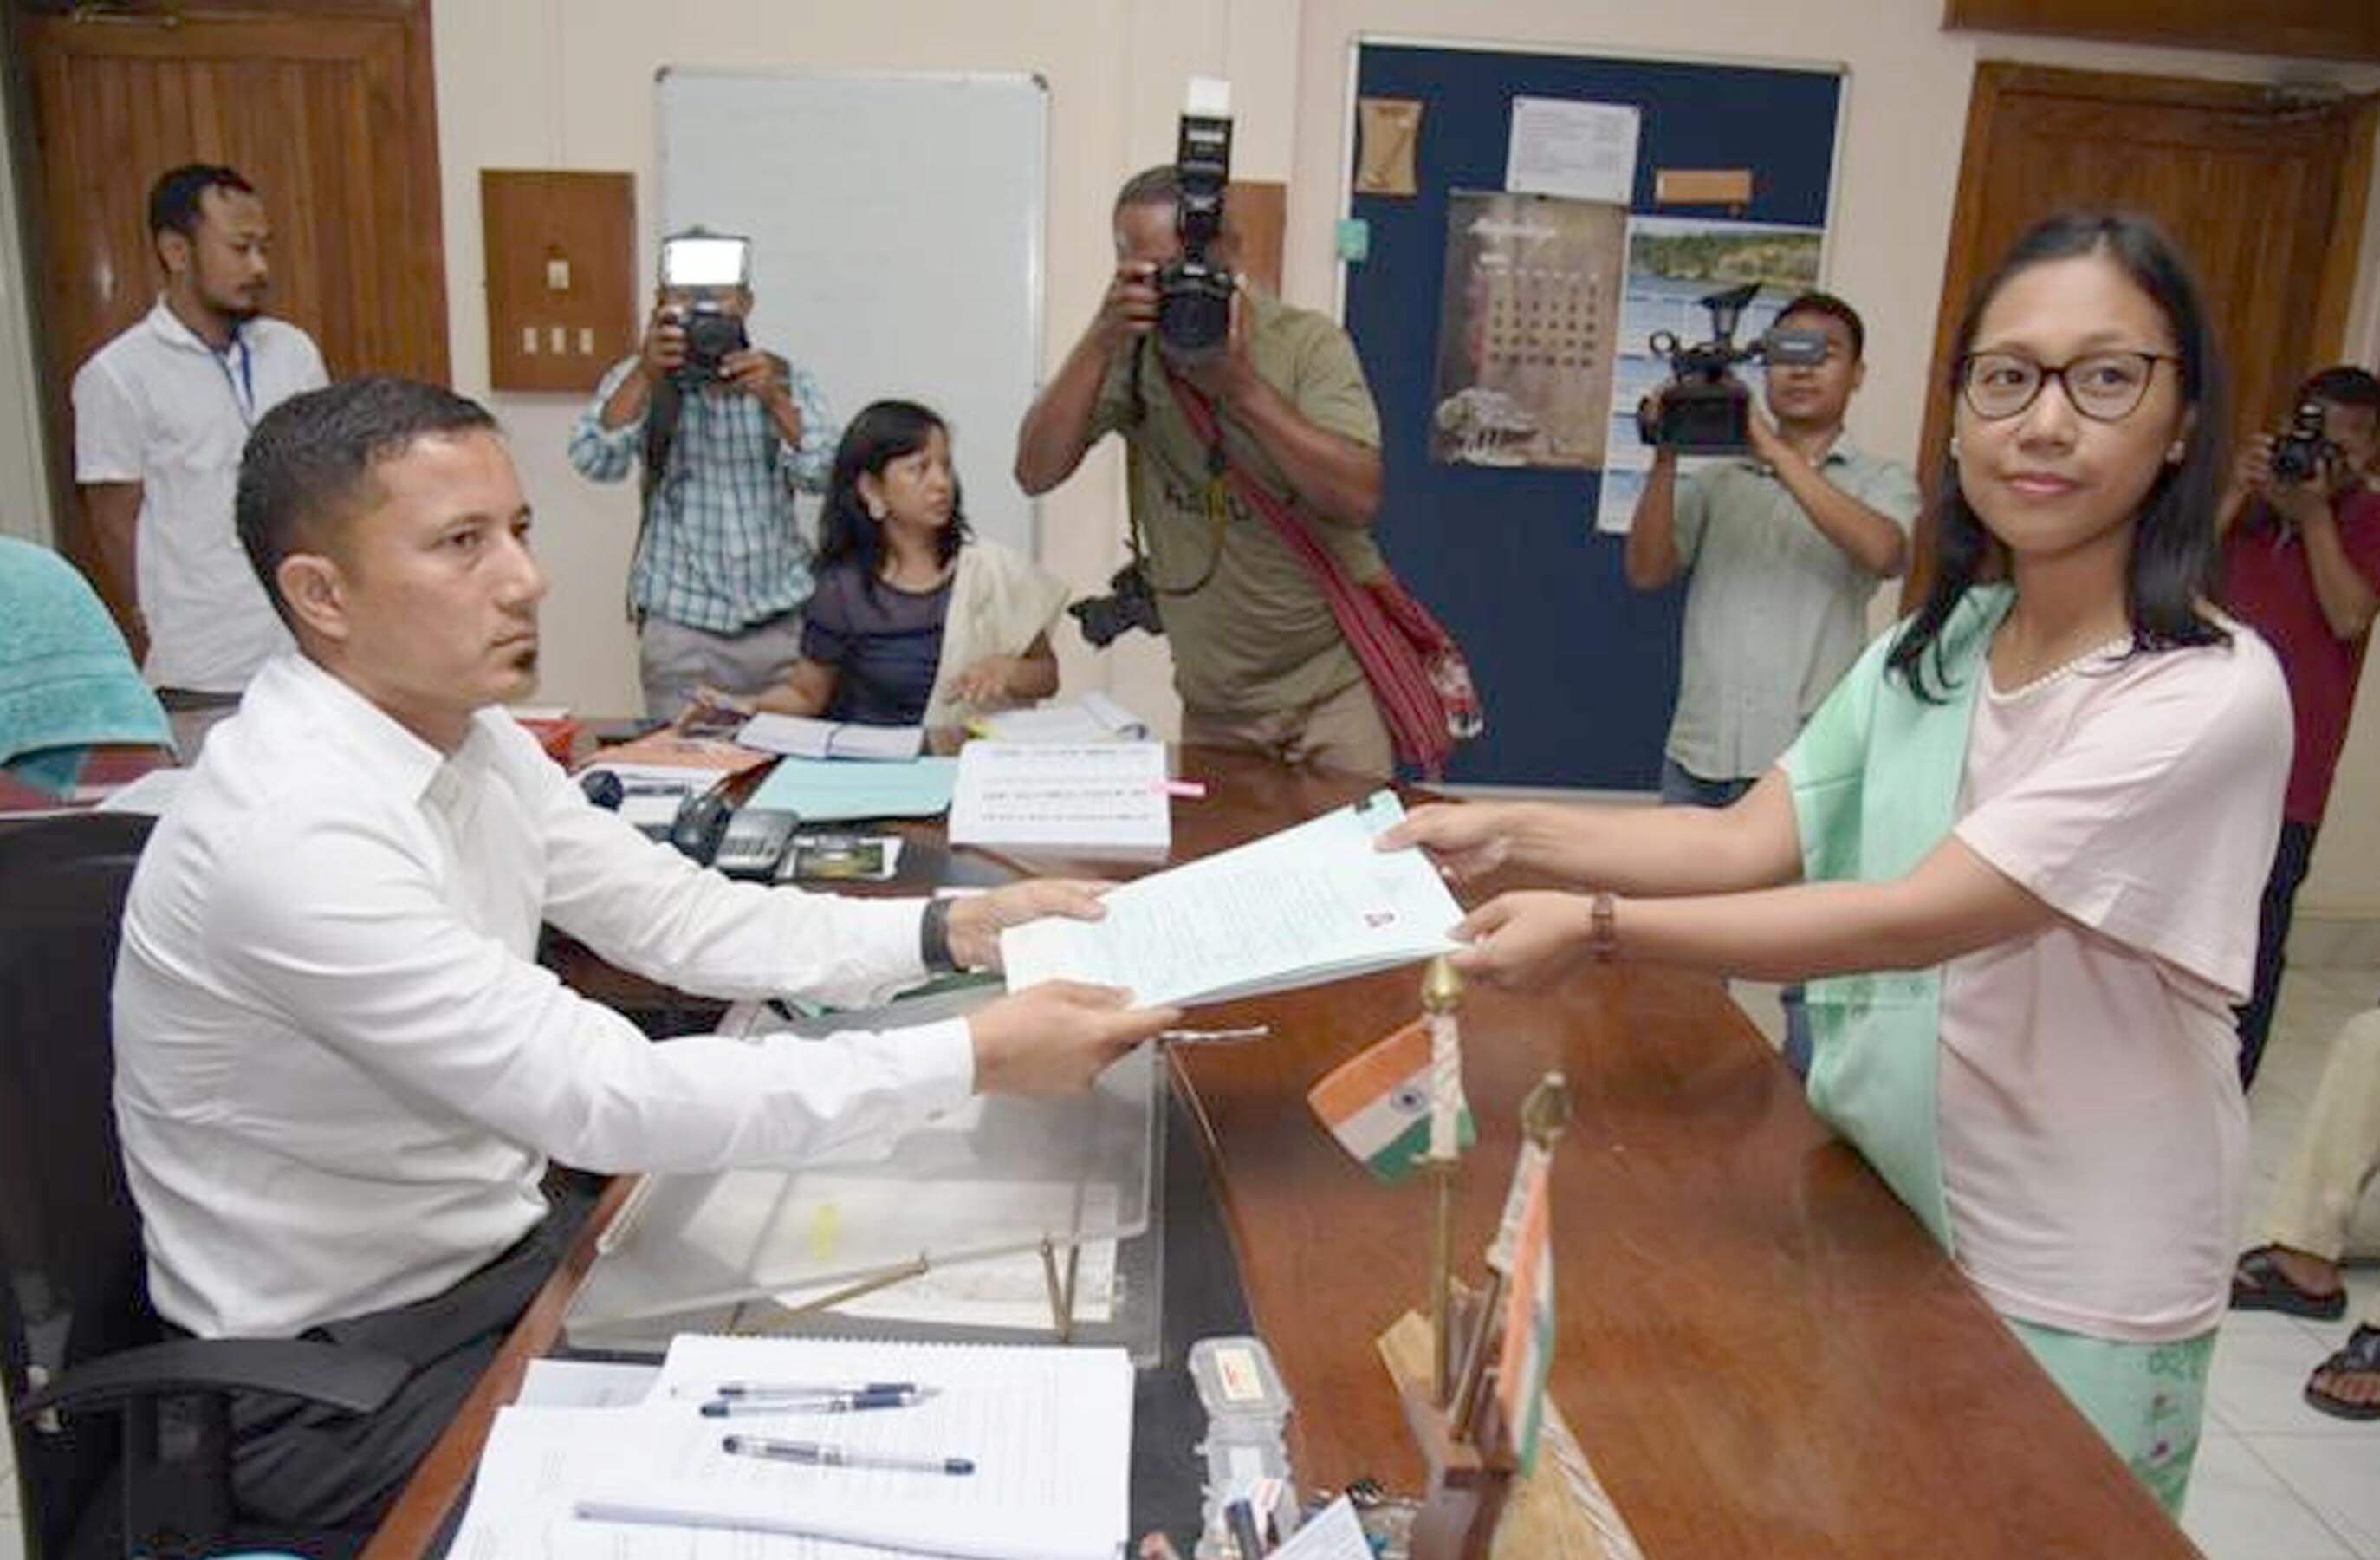 NPP Candidate Agatha Sangma files nomination for Tura Lok Sabha seat